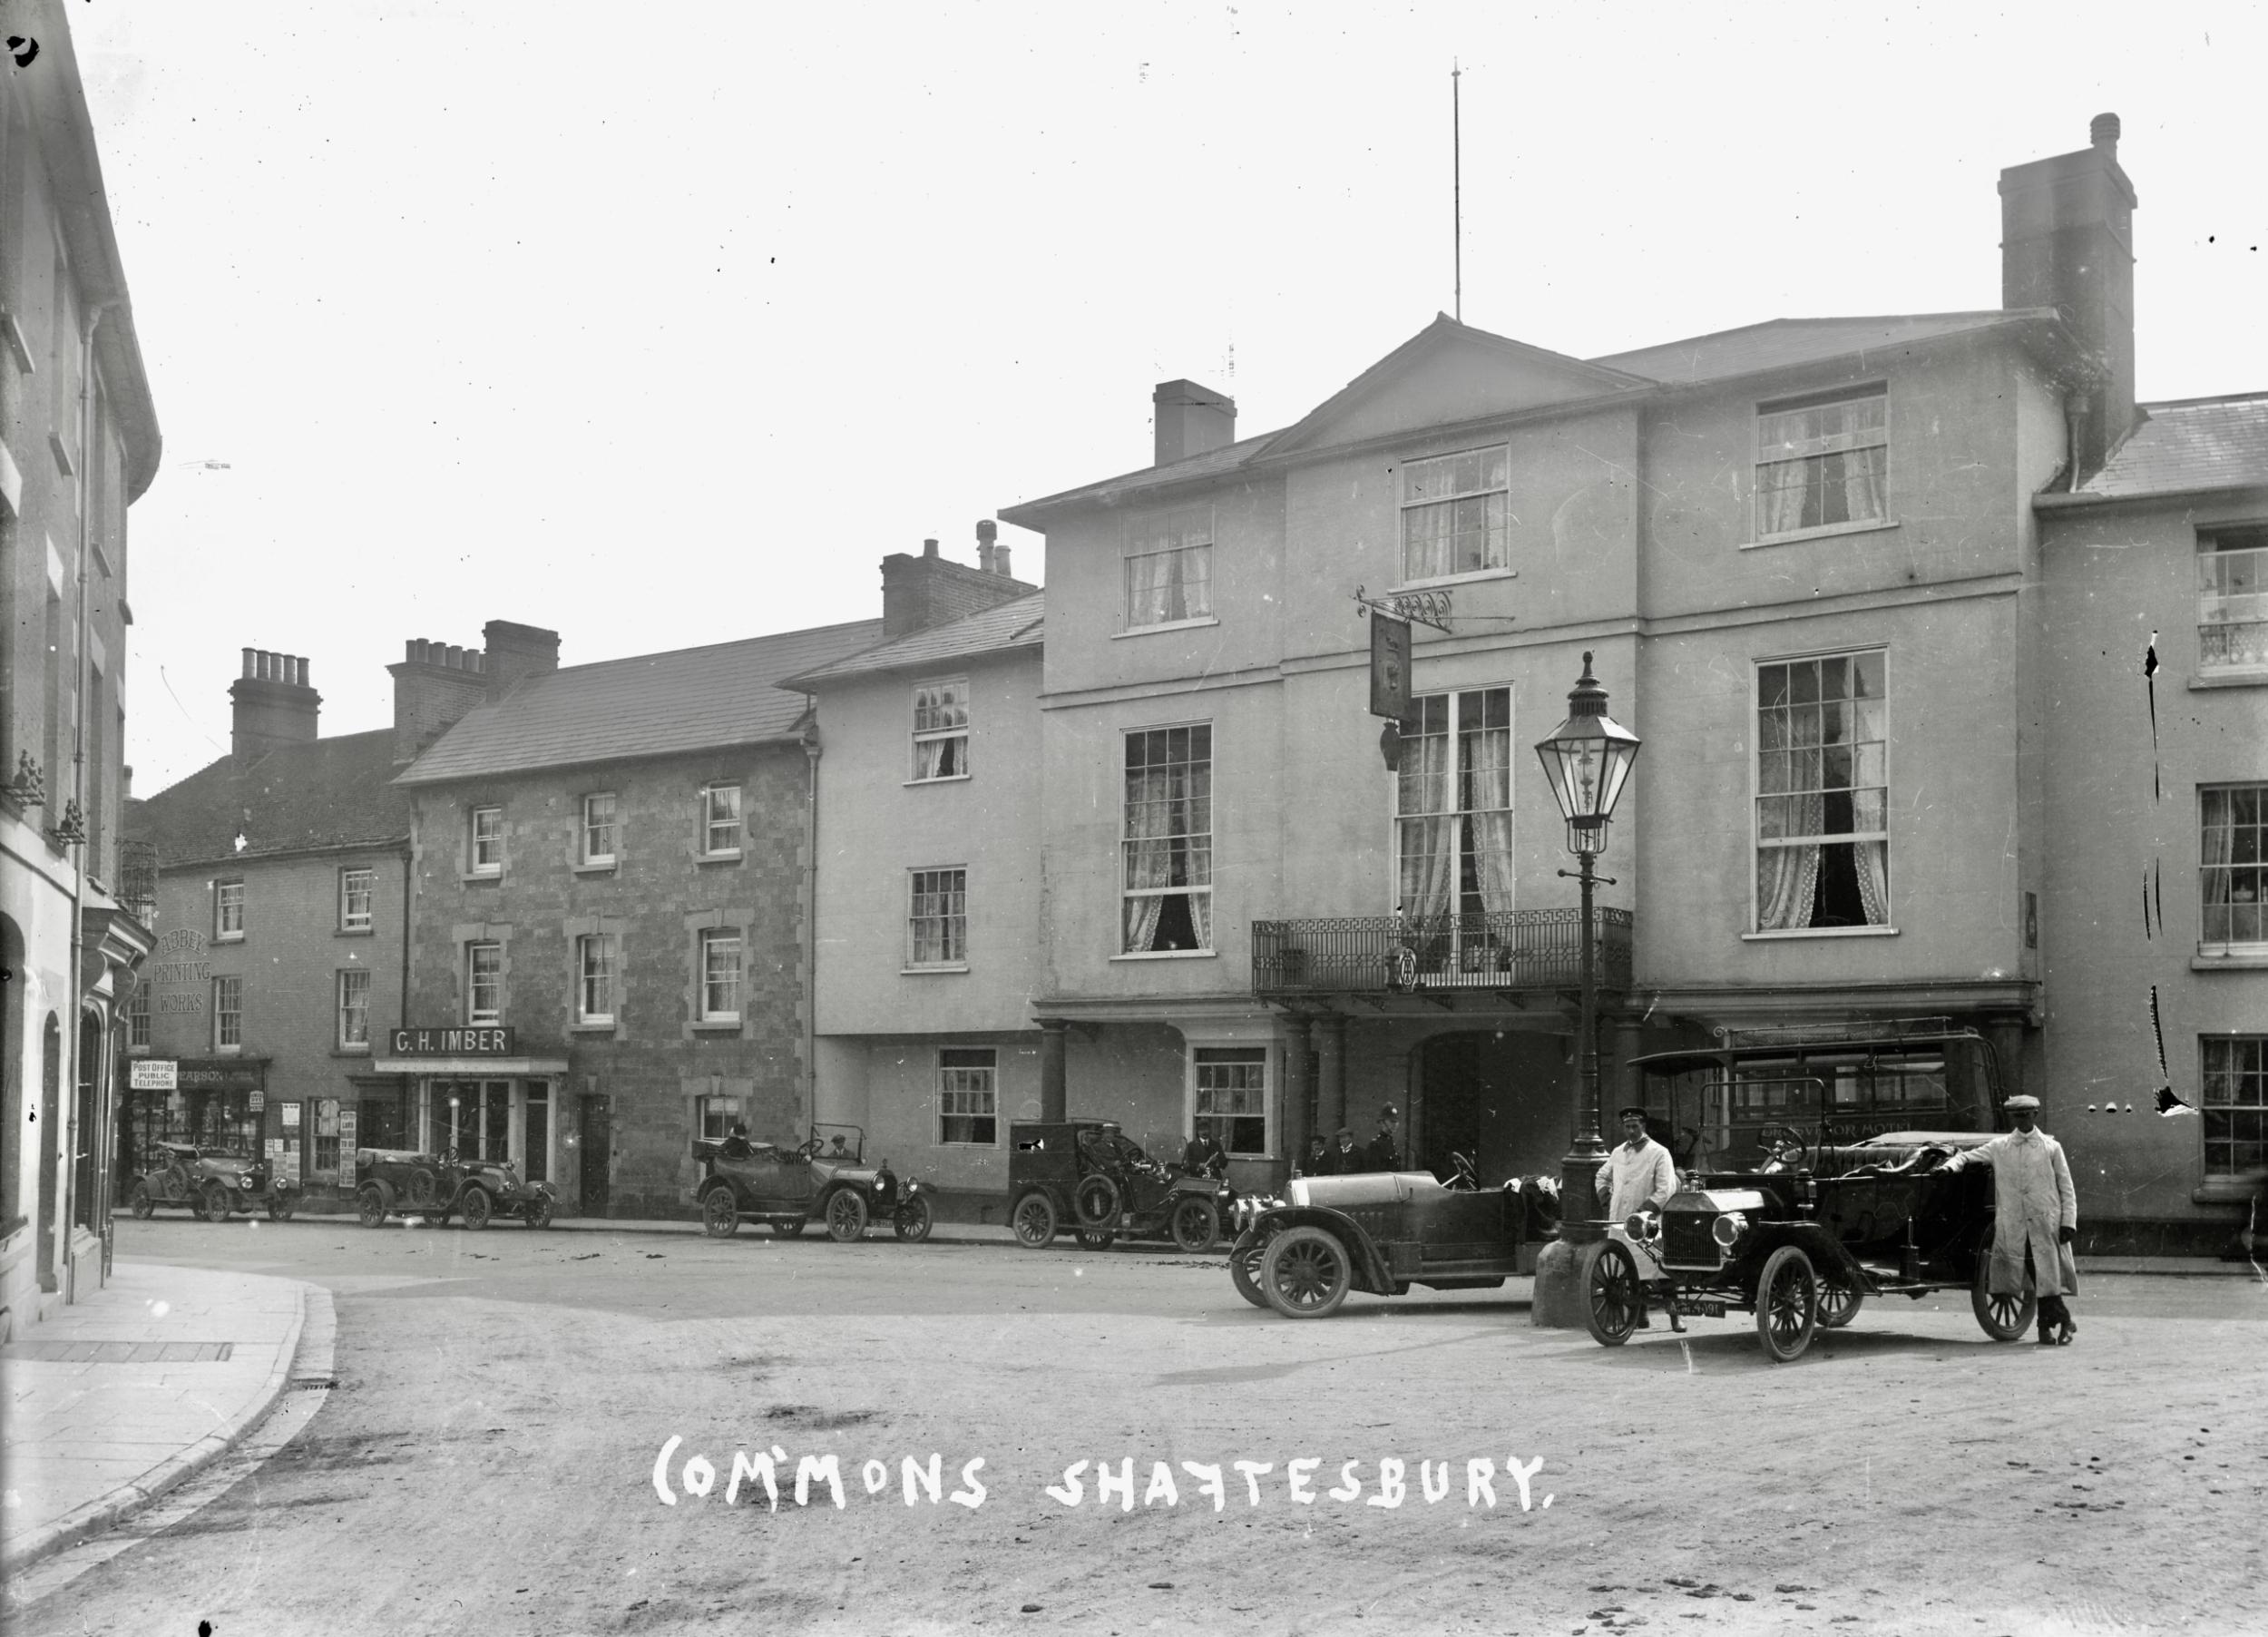 Shaftesbury High Street 5